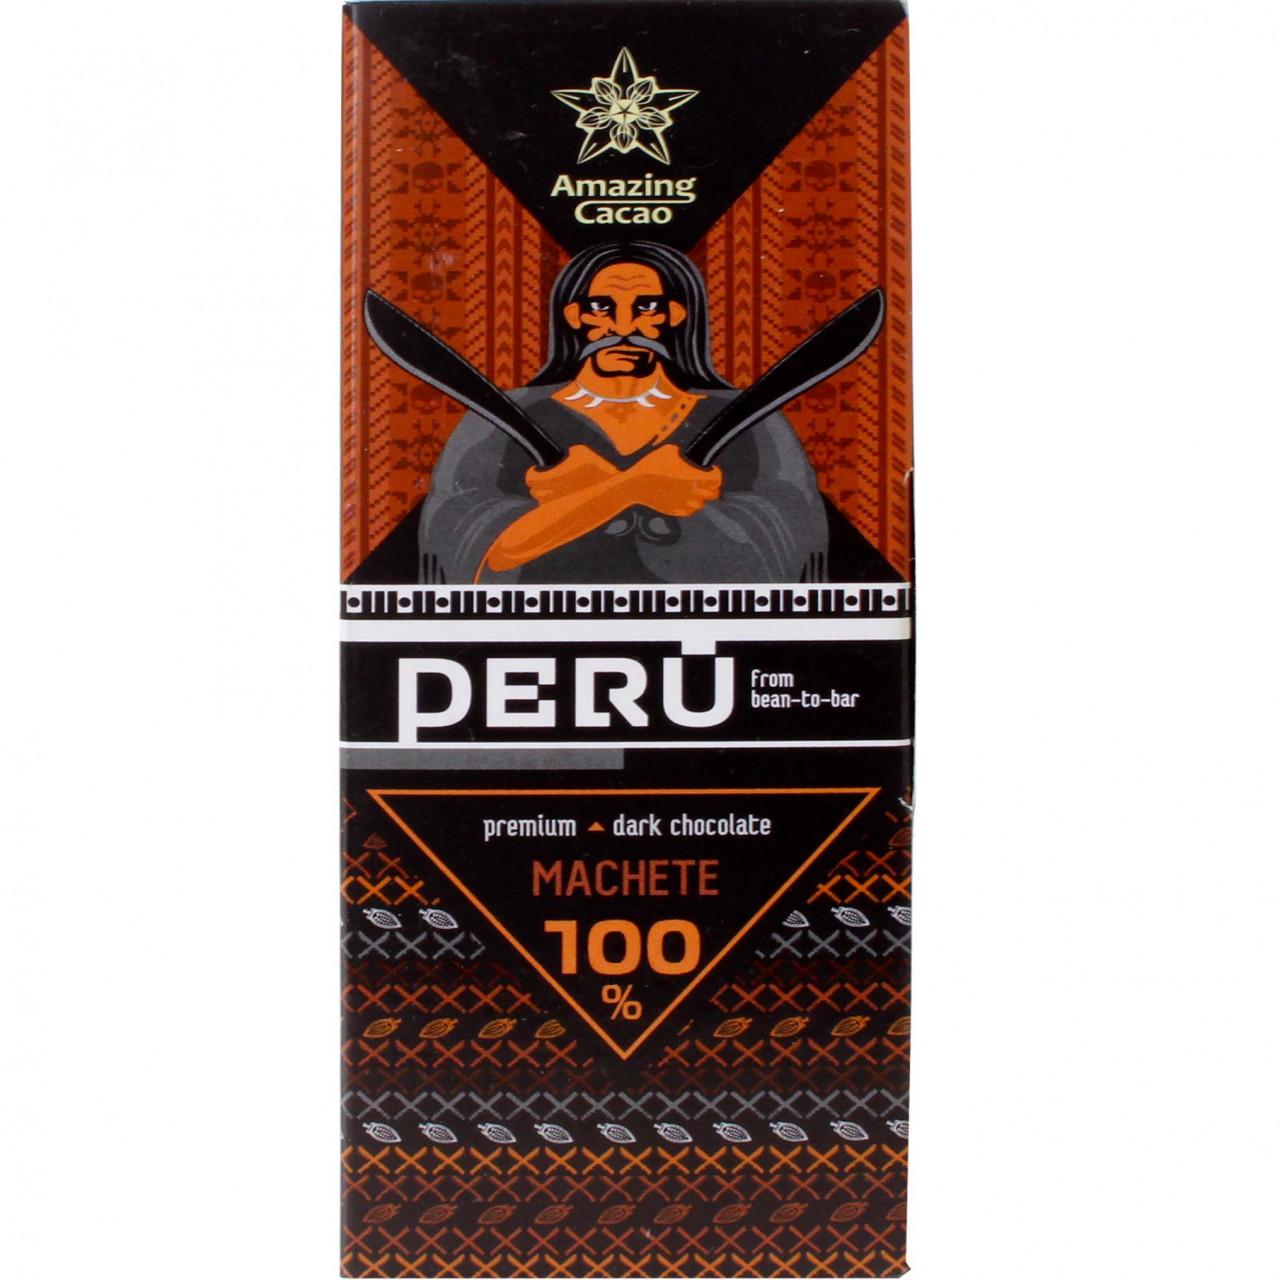 Peru Machete 100% dunkle Schokolade - Chocoladerepen, suikervrije chocolade, chocolade zonder toegevoegde suiker, Rusland, Russische chocolade - Chocolats-De-Luxe